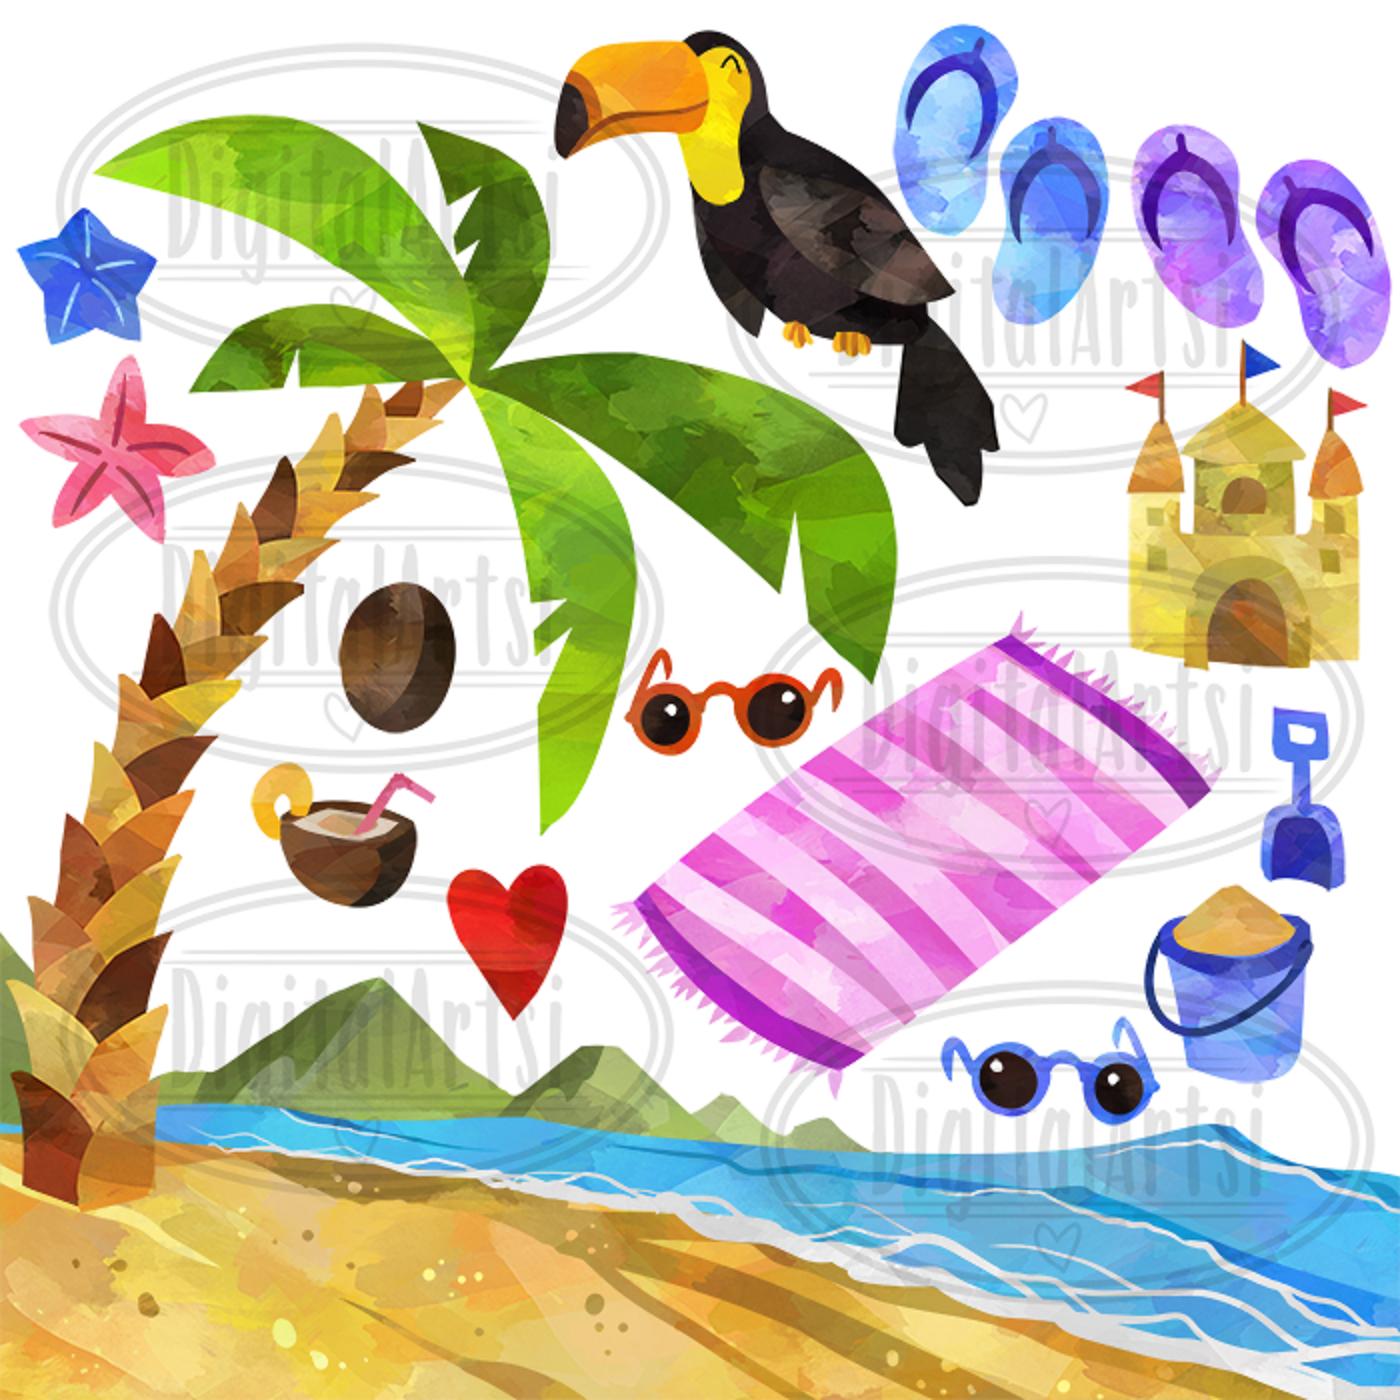 Tropical vacation clipart jpg Watercolor Tropical Vacation Clipart jpg